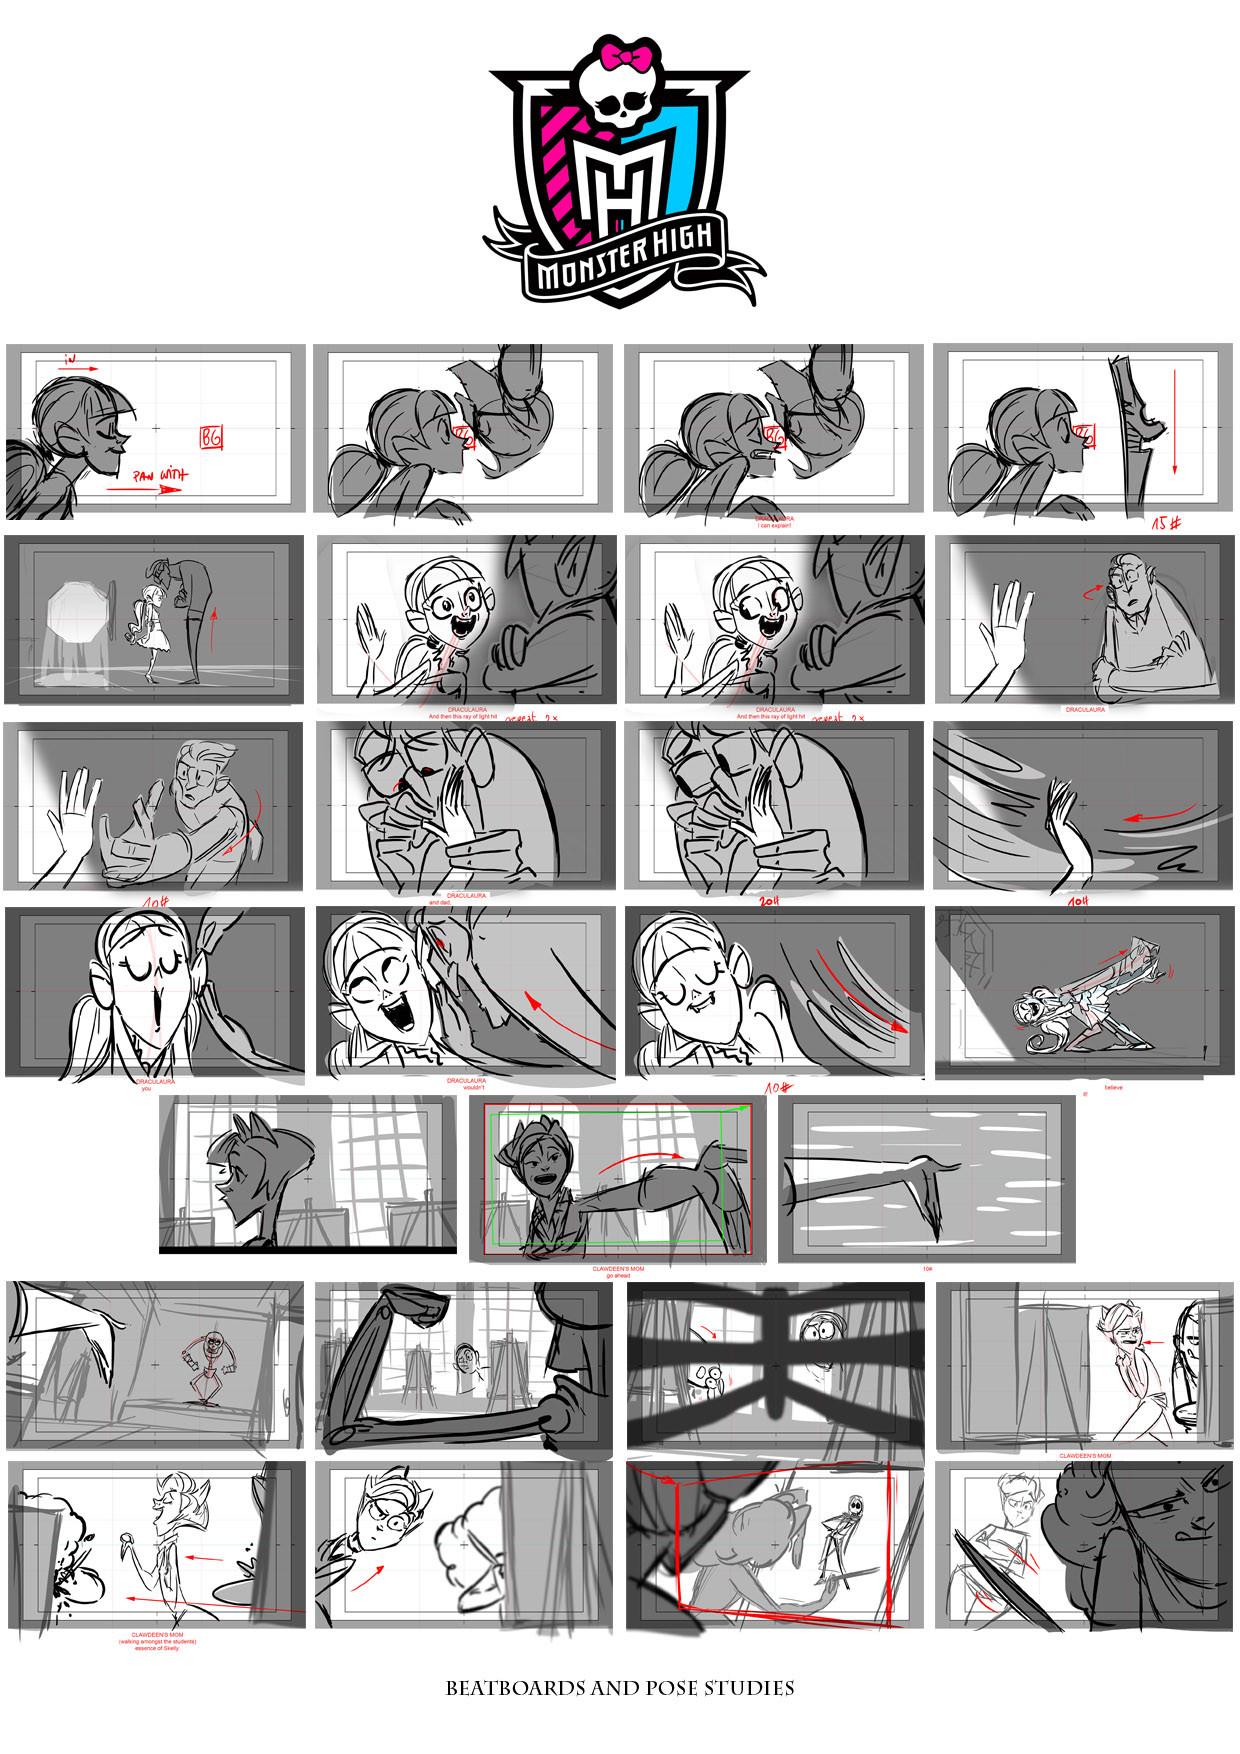 Miklos weigert storyboard page 10b